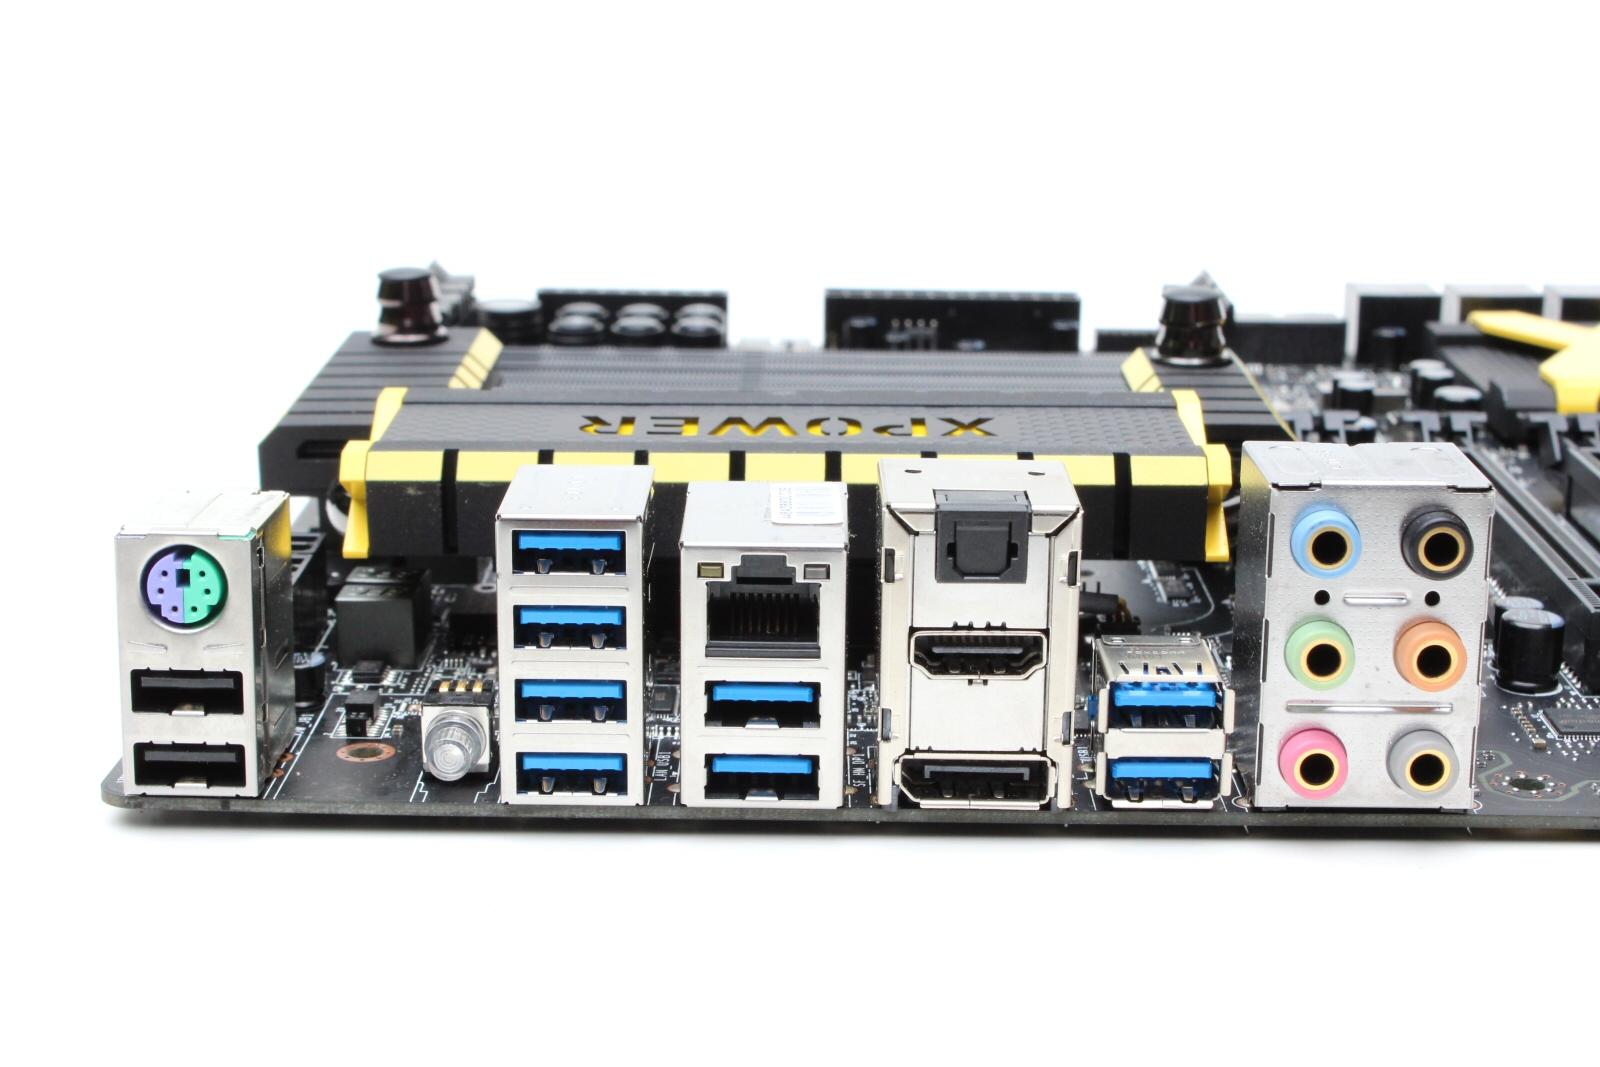 [Review] MSI Z97 XPower AC-img_5260.jpg